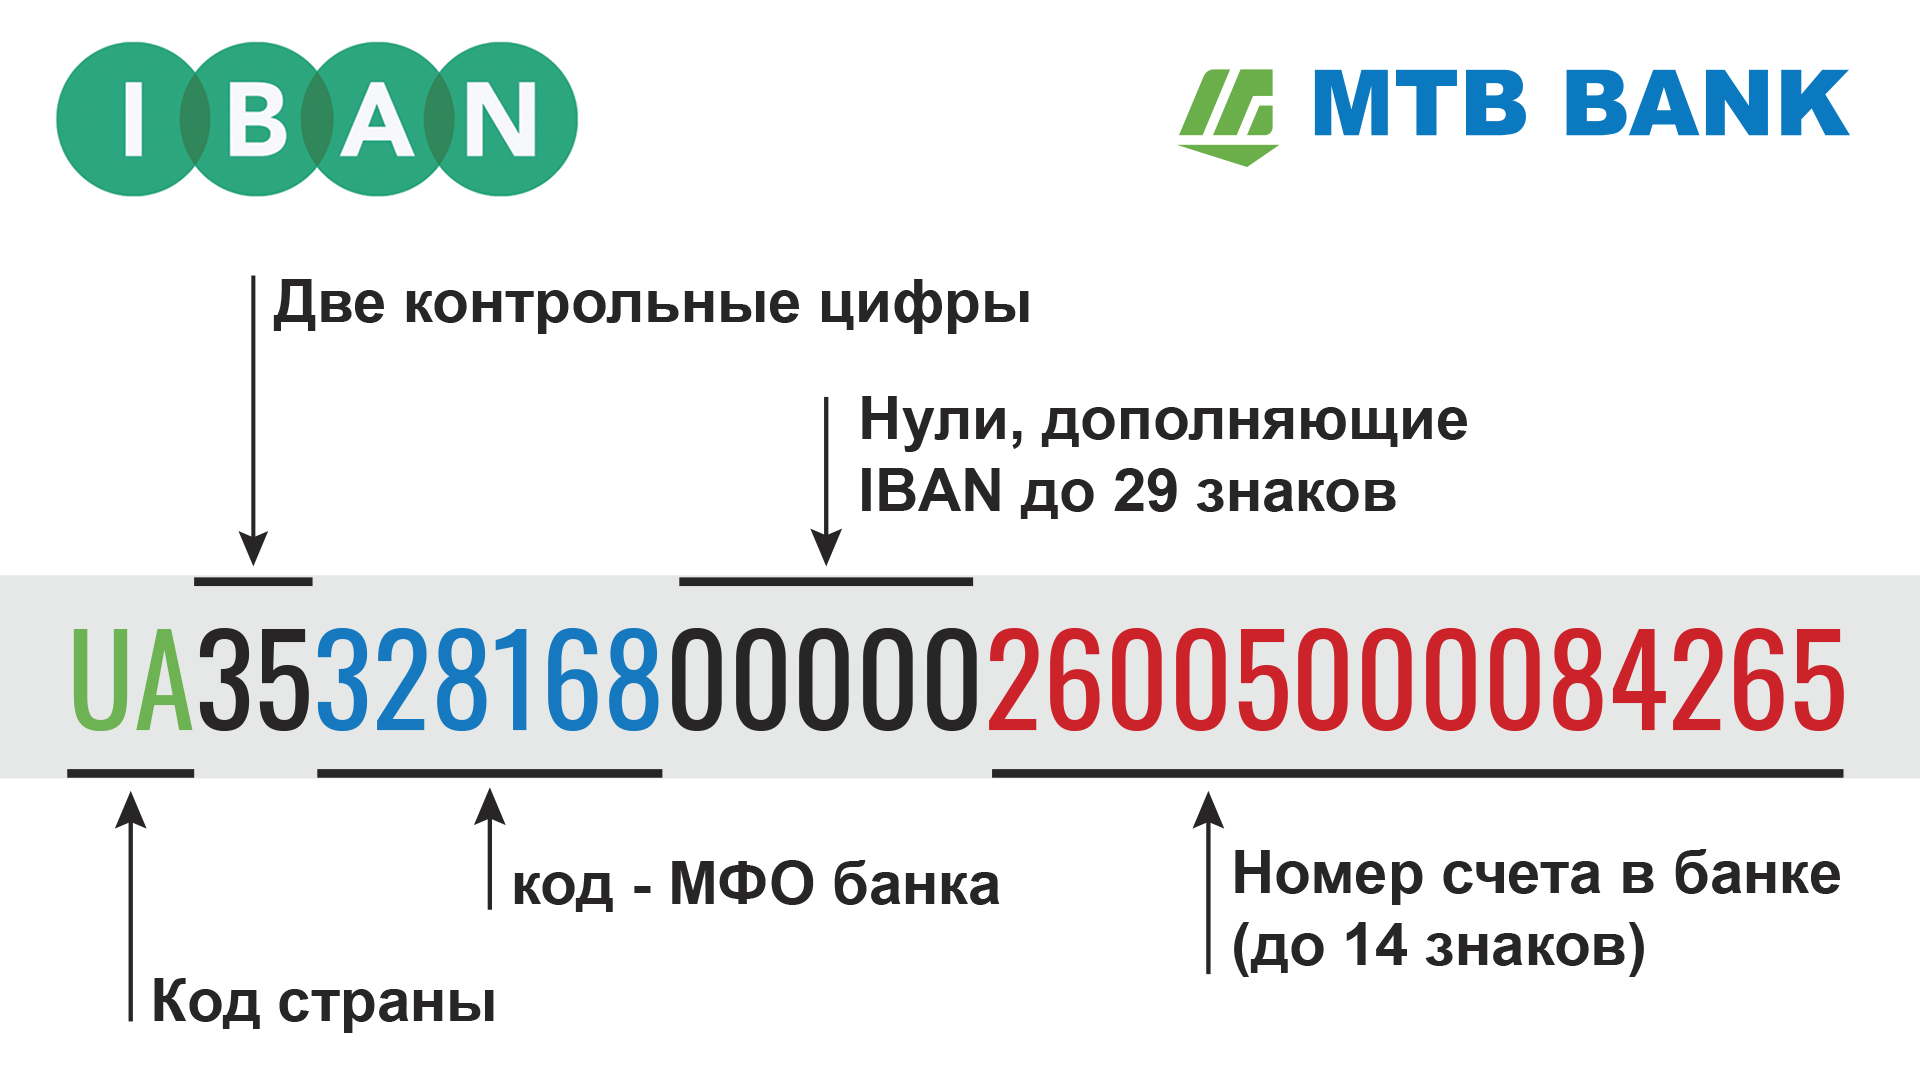 НБУ ВВОДИТЬ IBAN - фото - mtb.ua